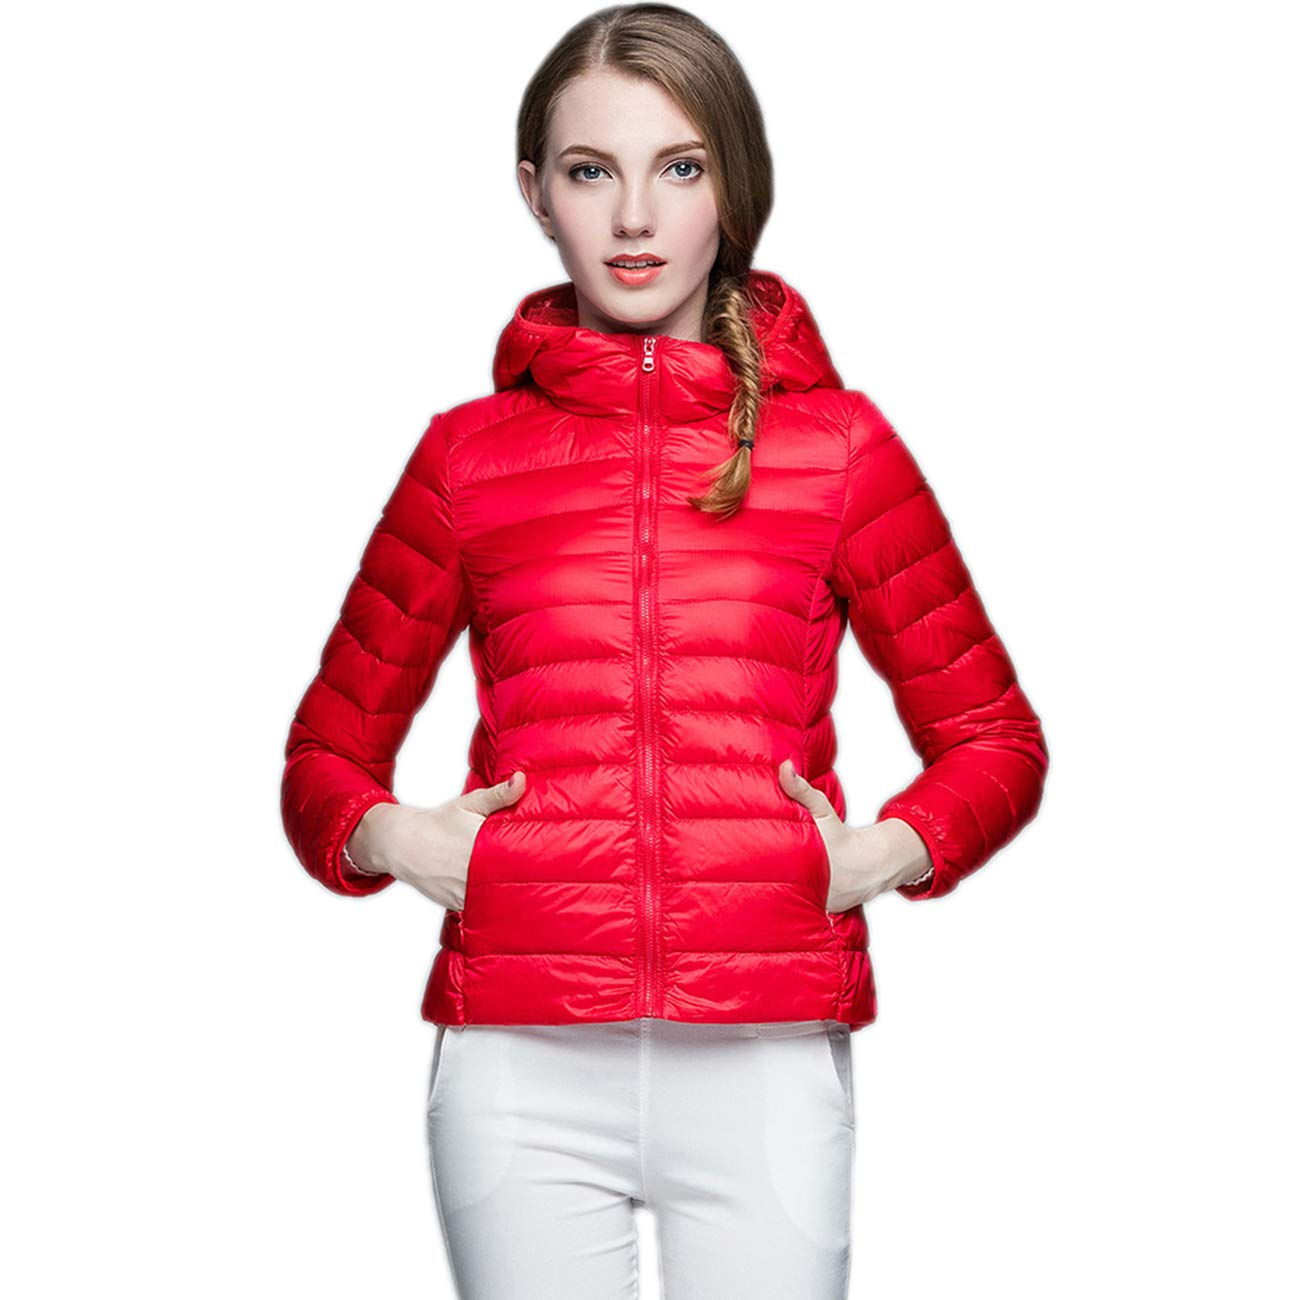 KIWI RATA Women's Hooded Packable Ultra Light Weight Short Down Jacket - Travel Bag by KIWI RATA (Image #3)